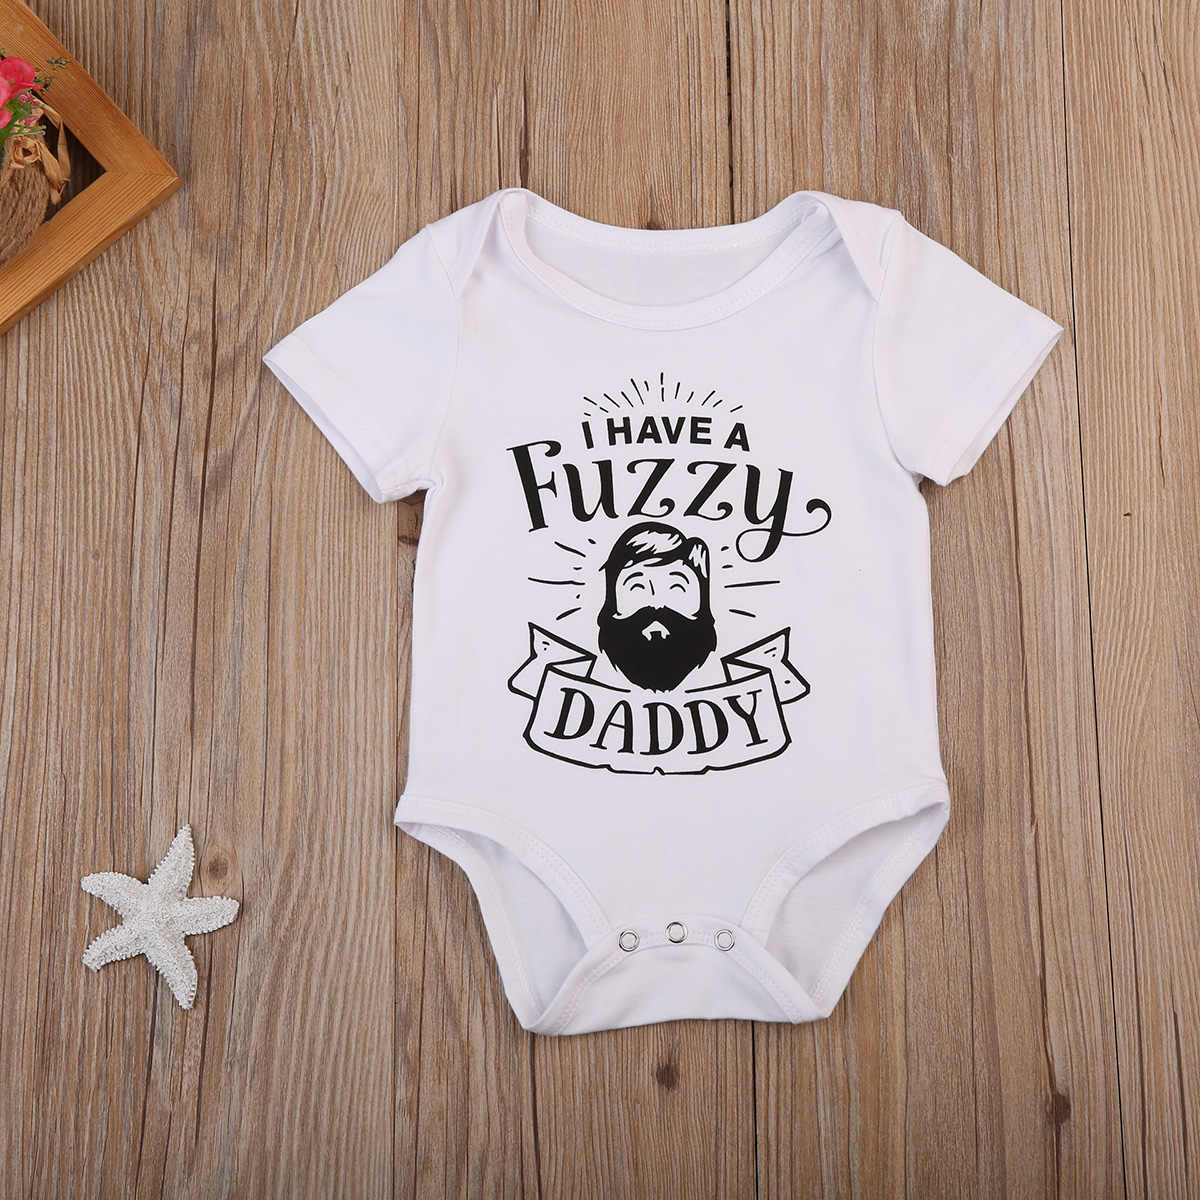 Precioso pelele para bebé de 0 a 24 meses, Pelele de algodón para niño de manga corta, ropa blanca borrosa para papá, mono, ropa Casual, atuendo